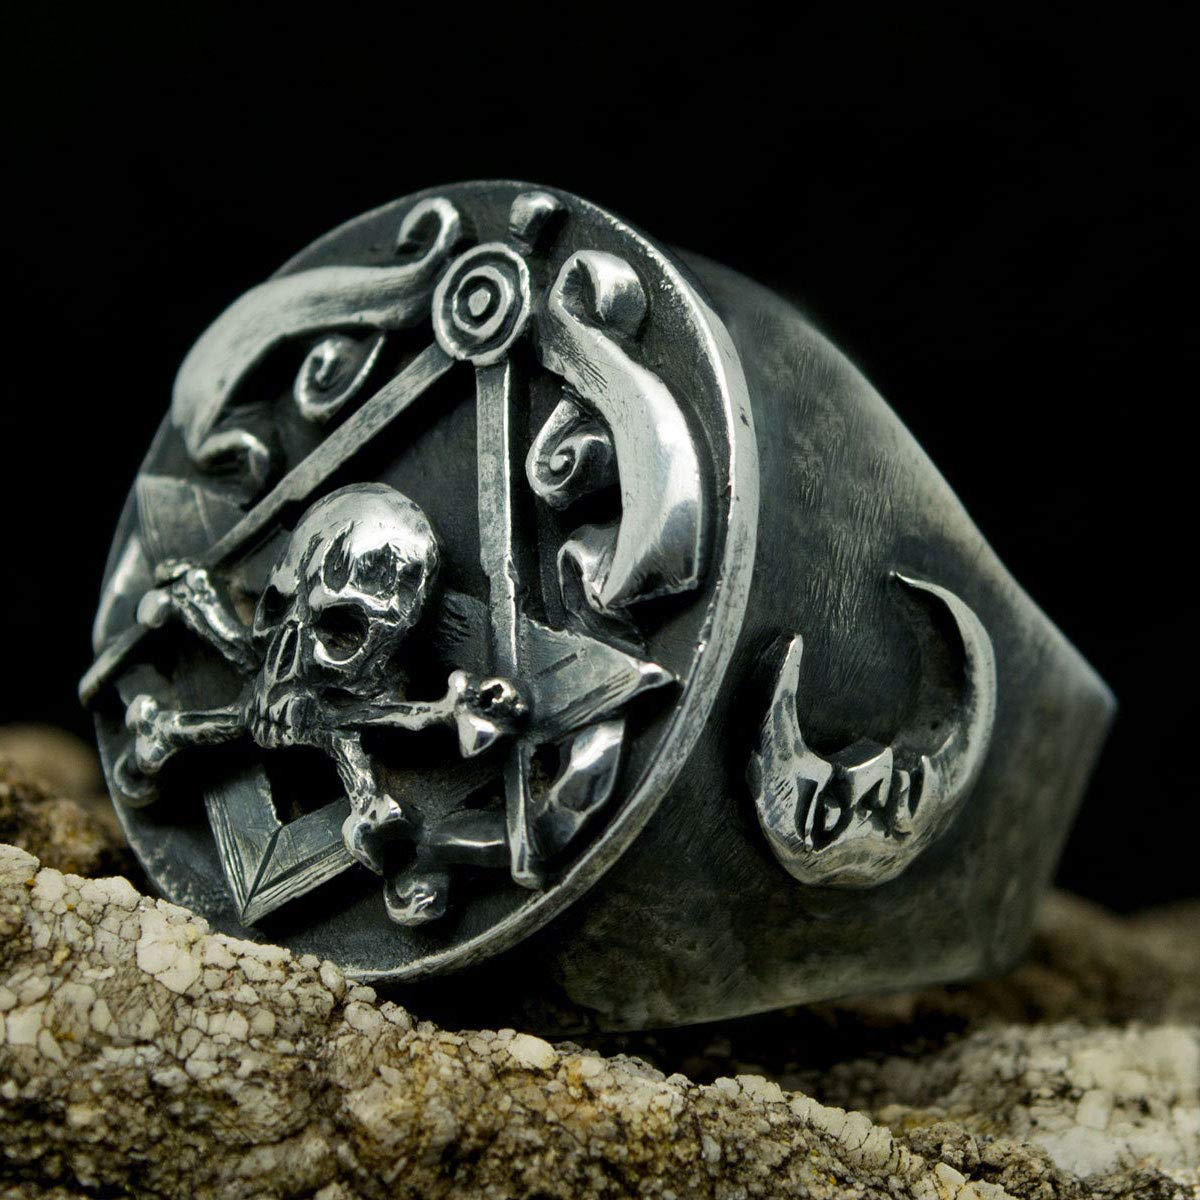 SignoArt Handmade Masonic Ring Silver Skull Crossbones Gothic Mens Black Oxidized Jewelry Biker Gift All Sizes